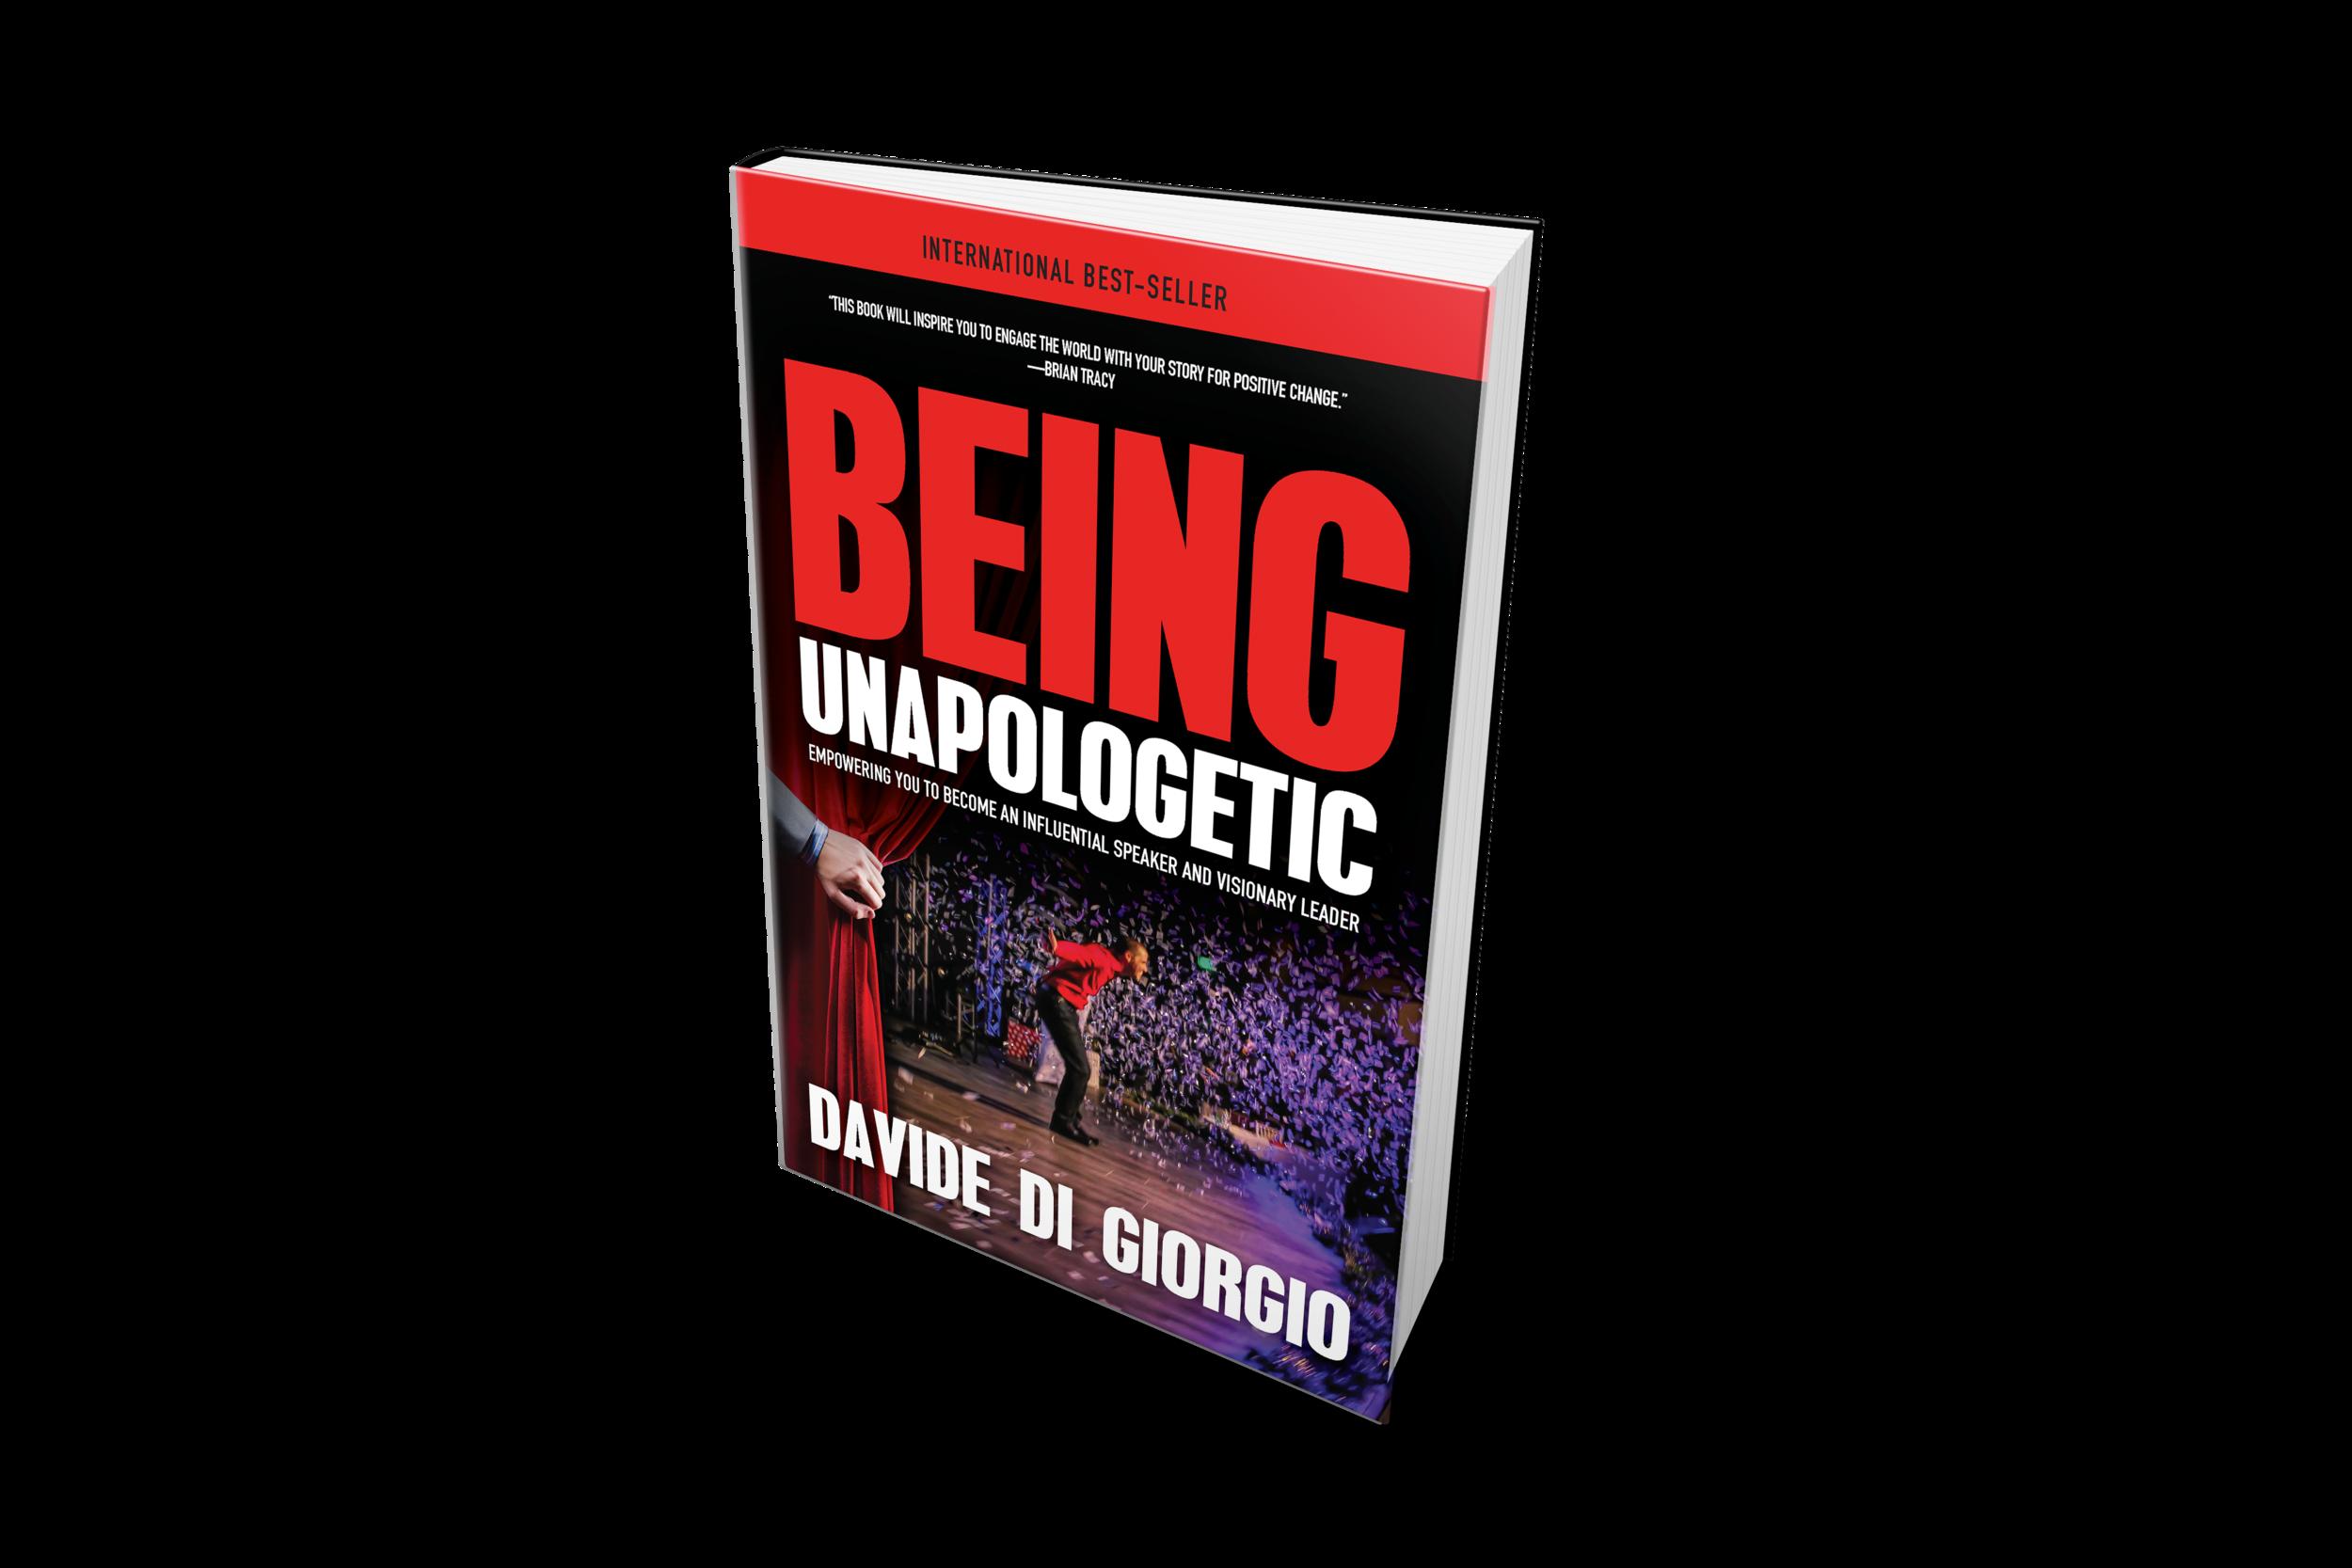 069-6x9-Hardcover-Ebook Best Seller.png